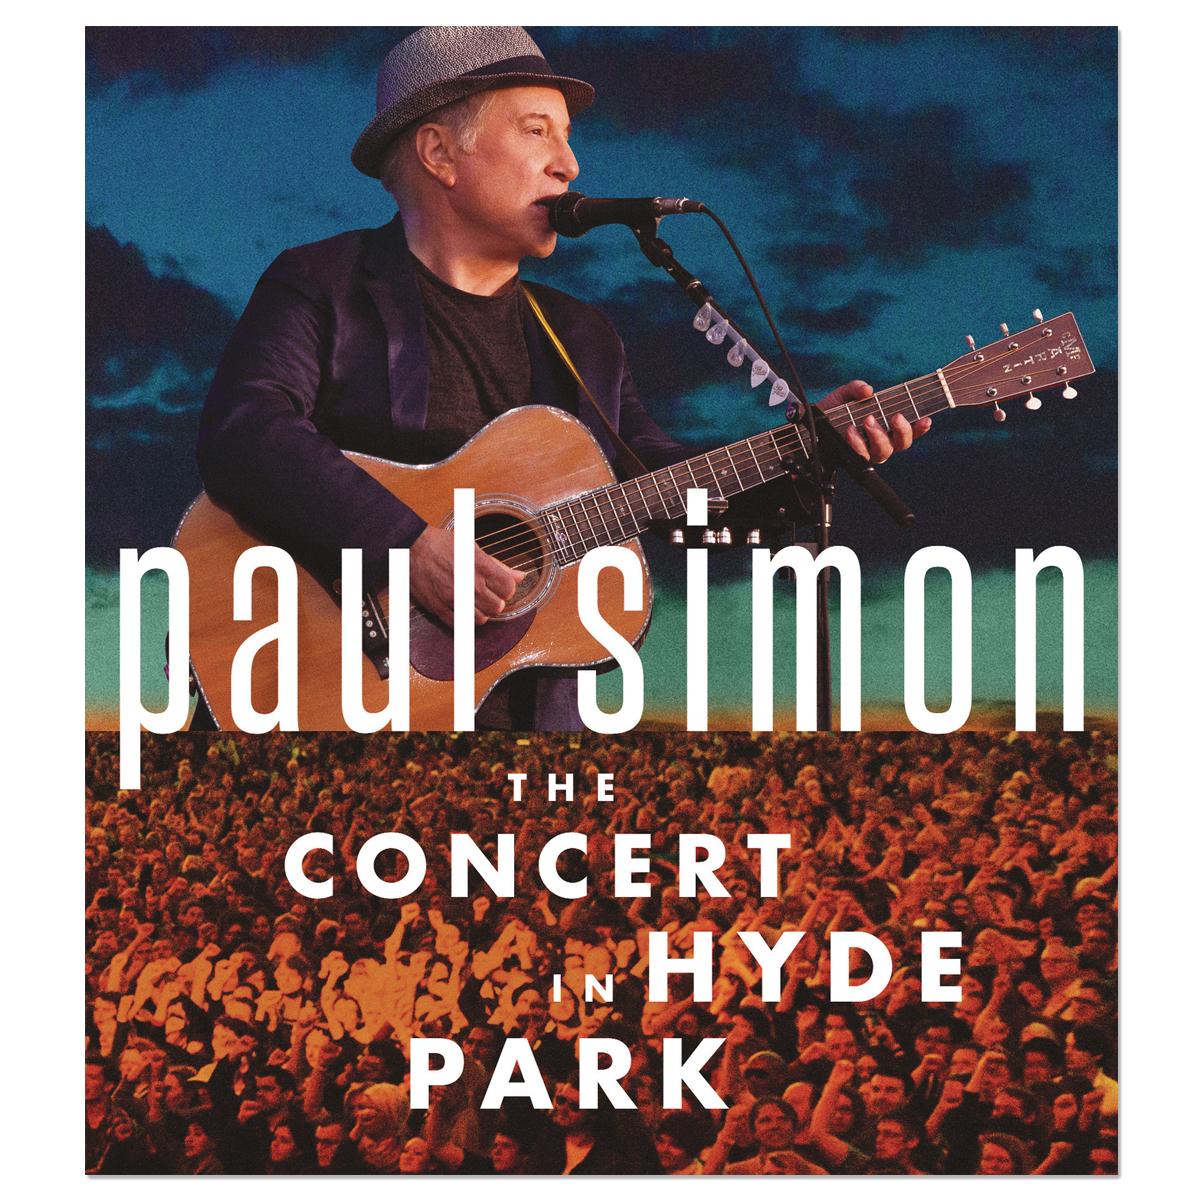 Paul Simon The Concert in Hyde Park CD/DVD